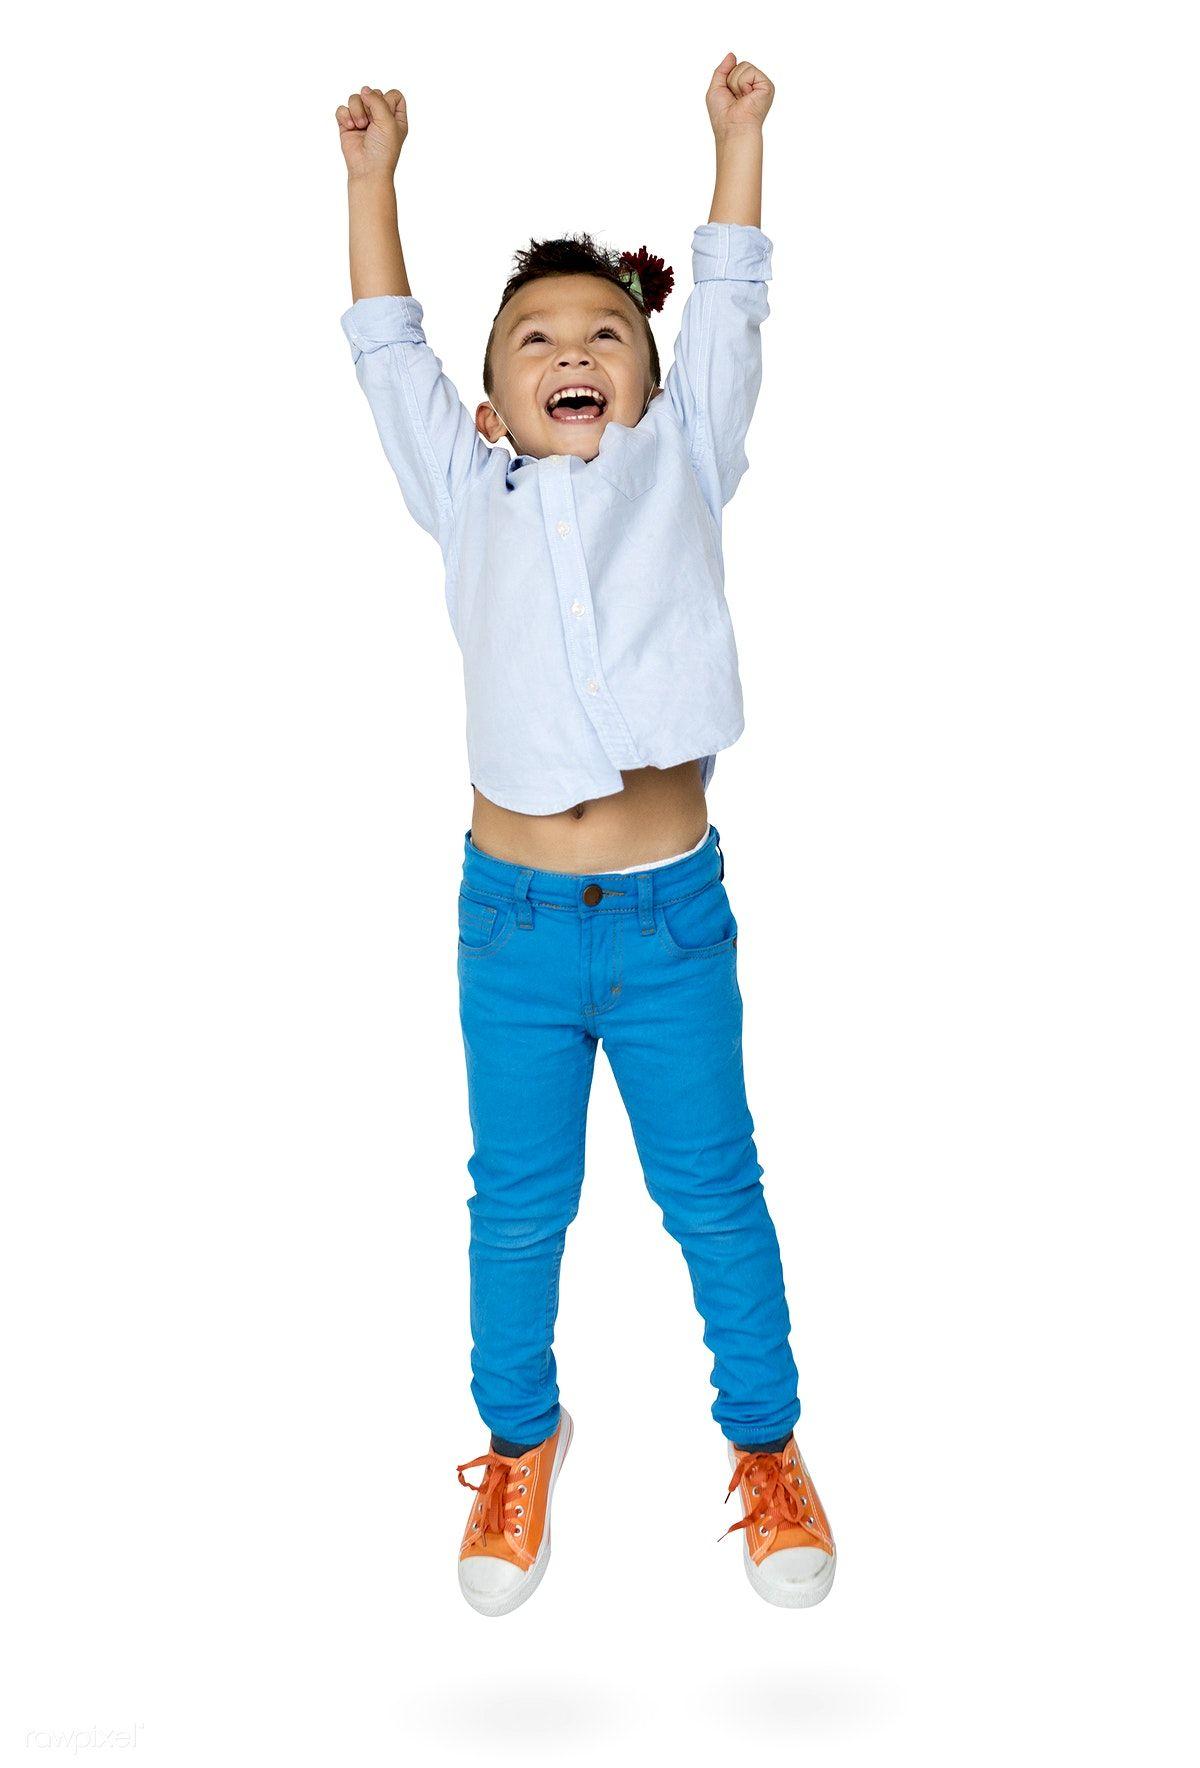 Download Premium Psd Of Little Boy Junping Enjoy Happiness Cheerful Studio People Png Kids Club Studio Portraits